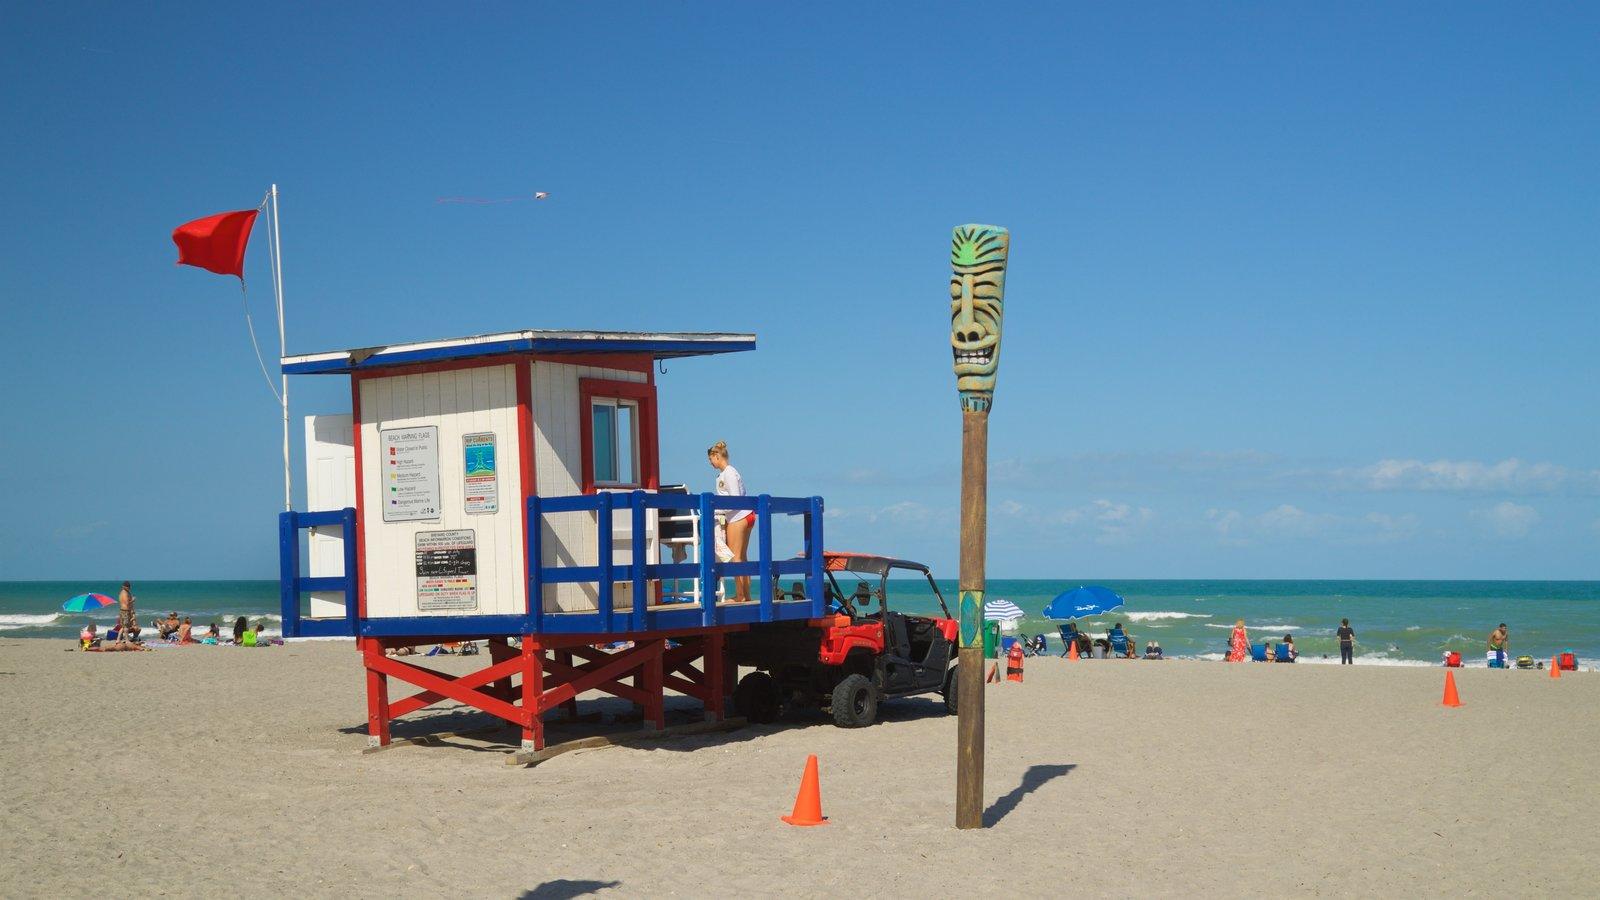 Cocoa Beach which includes a sandy beach and general coastal views